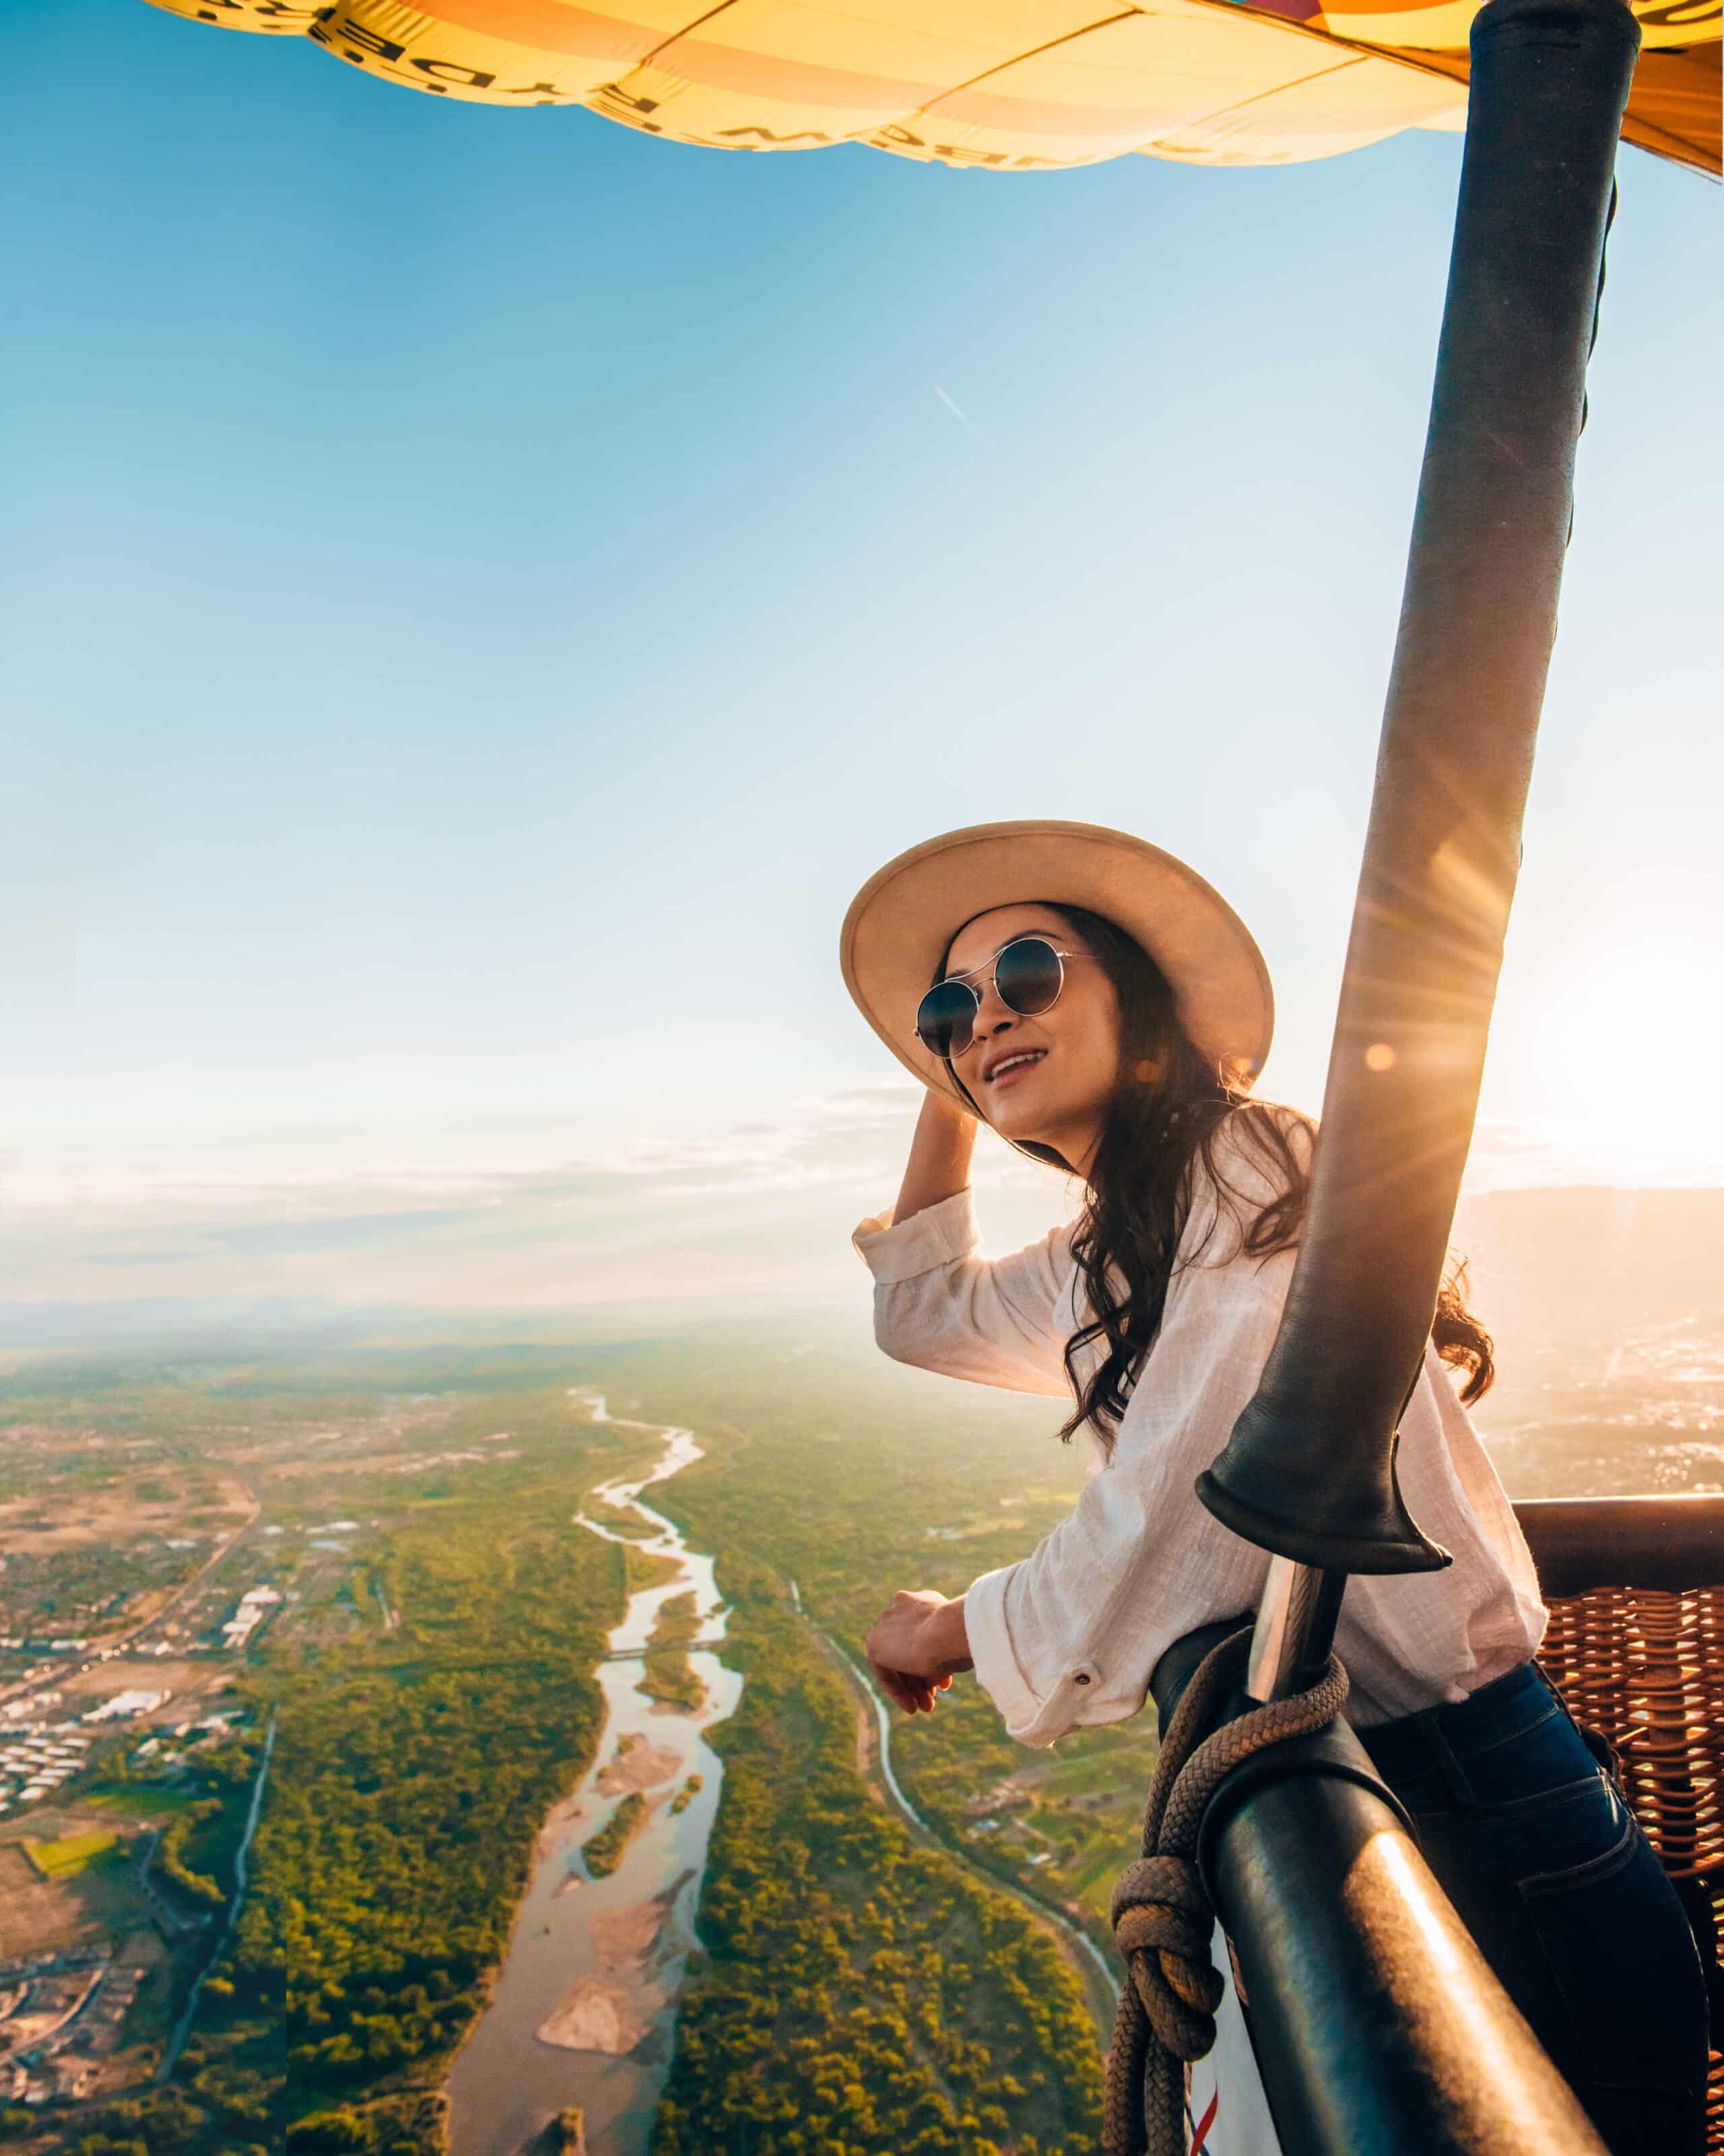 20 Things You'll Find at the Hyatt Regency Tamaya in New Mexico